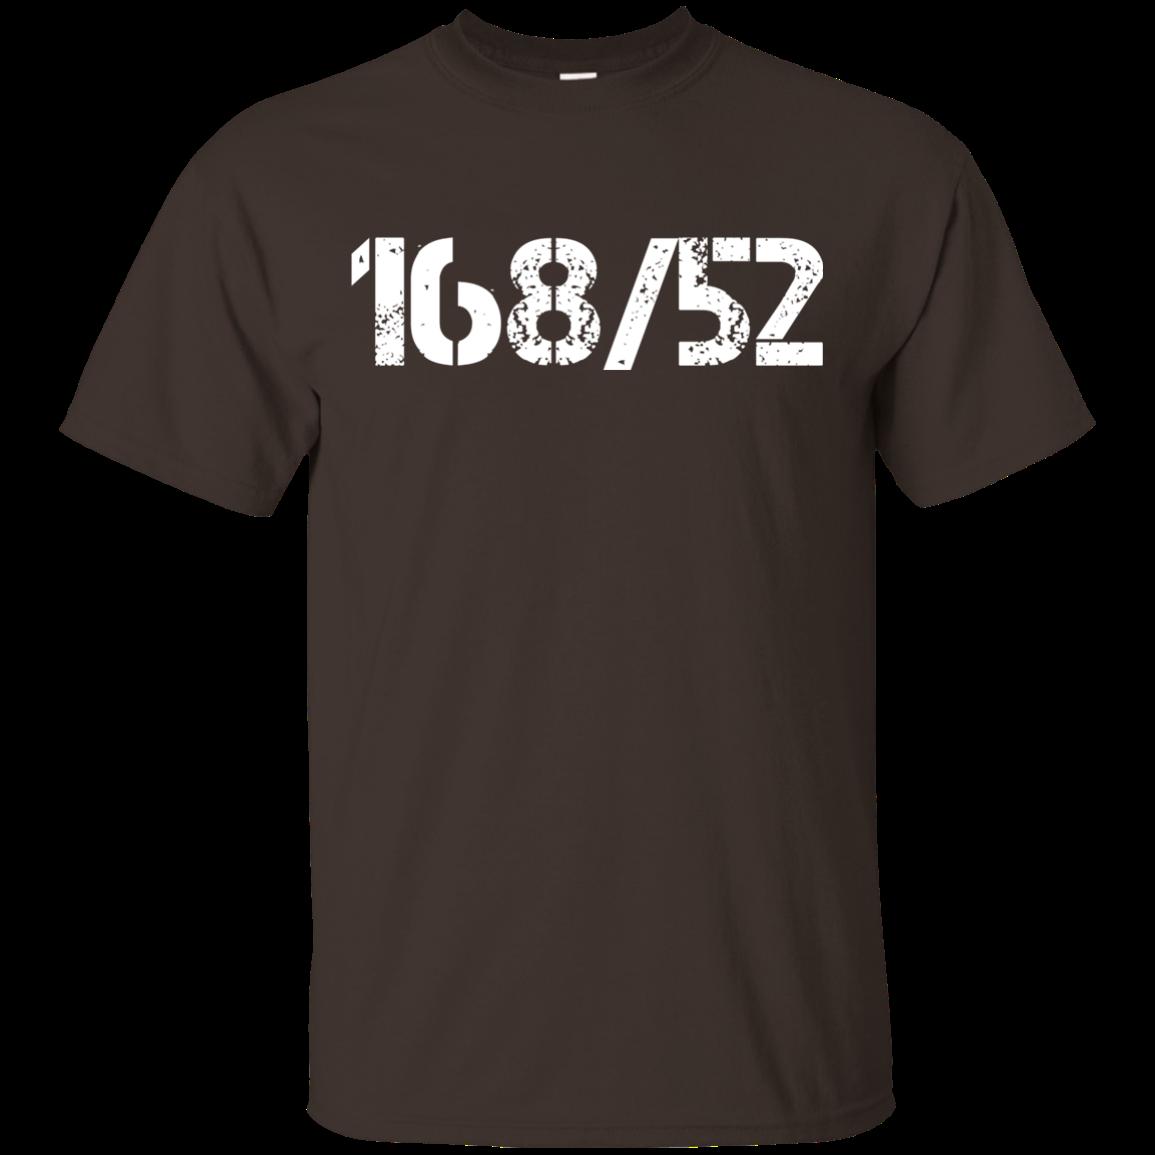 168/52 TShirt T shirts for women, Shirts, T shirt